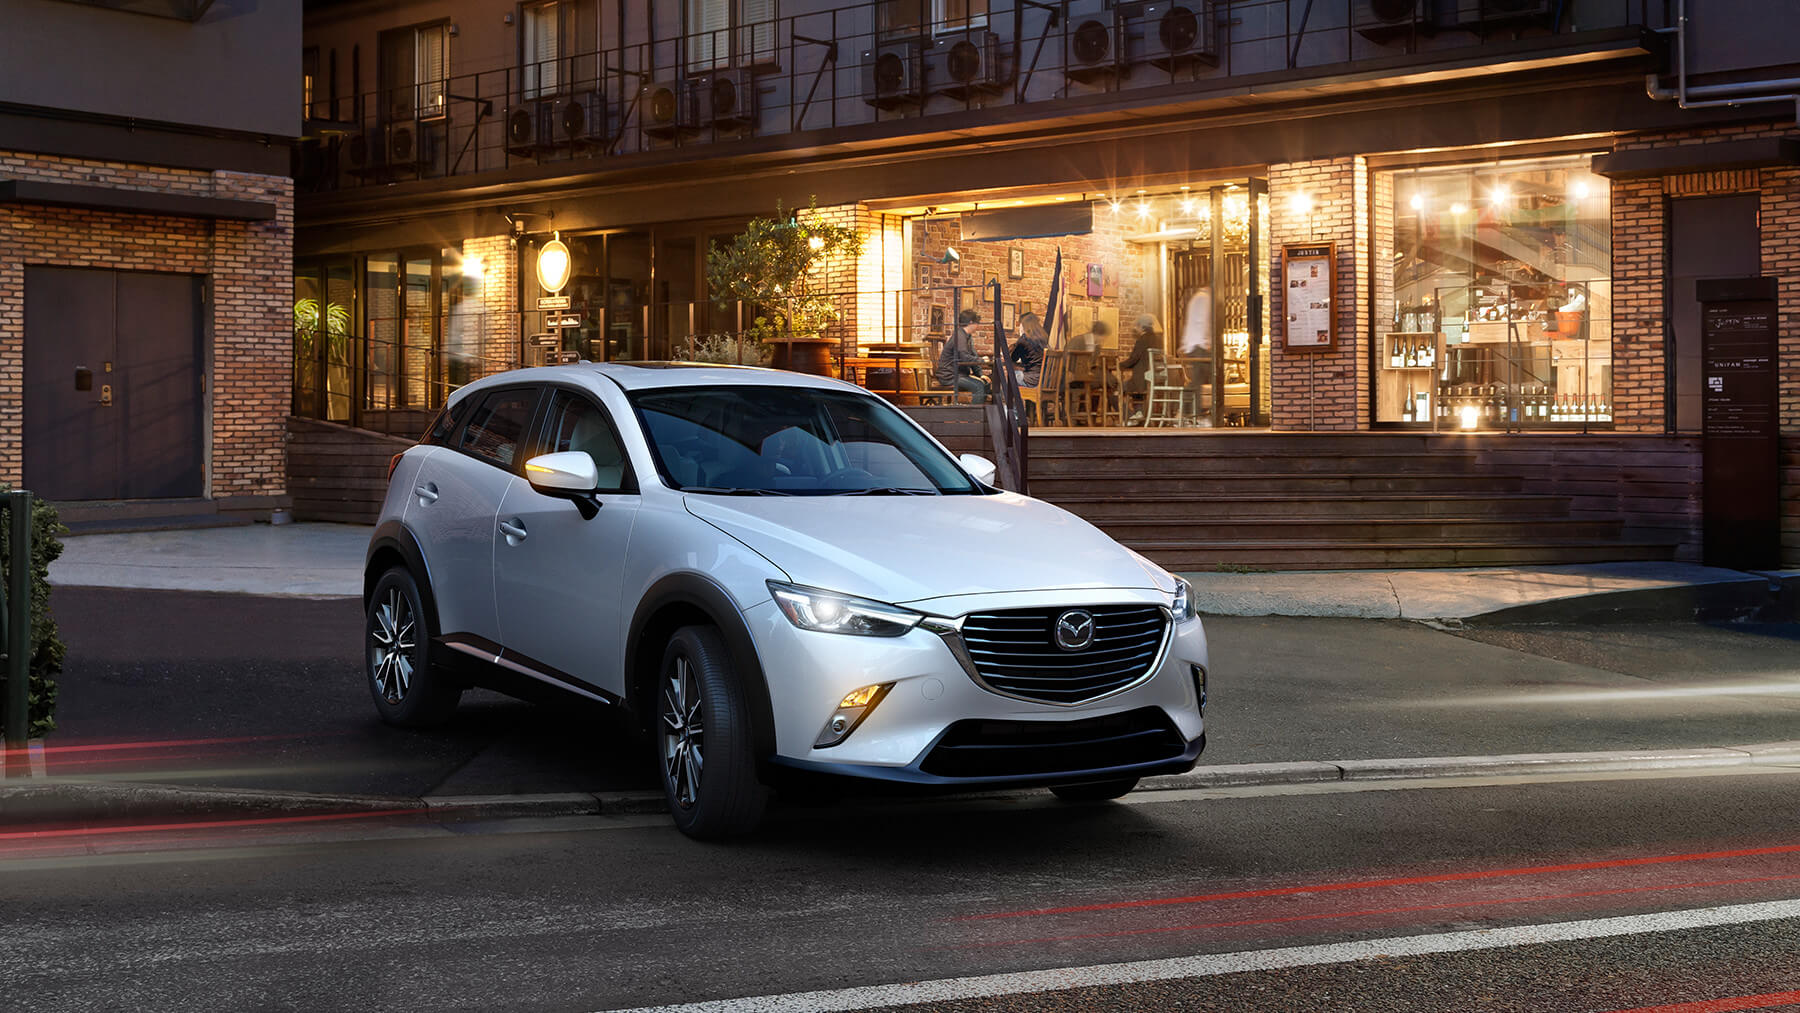 The 2017 Mazda CX-3 Lineup